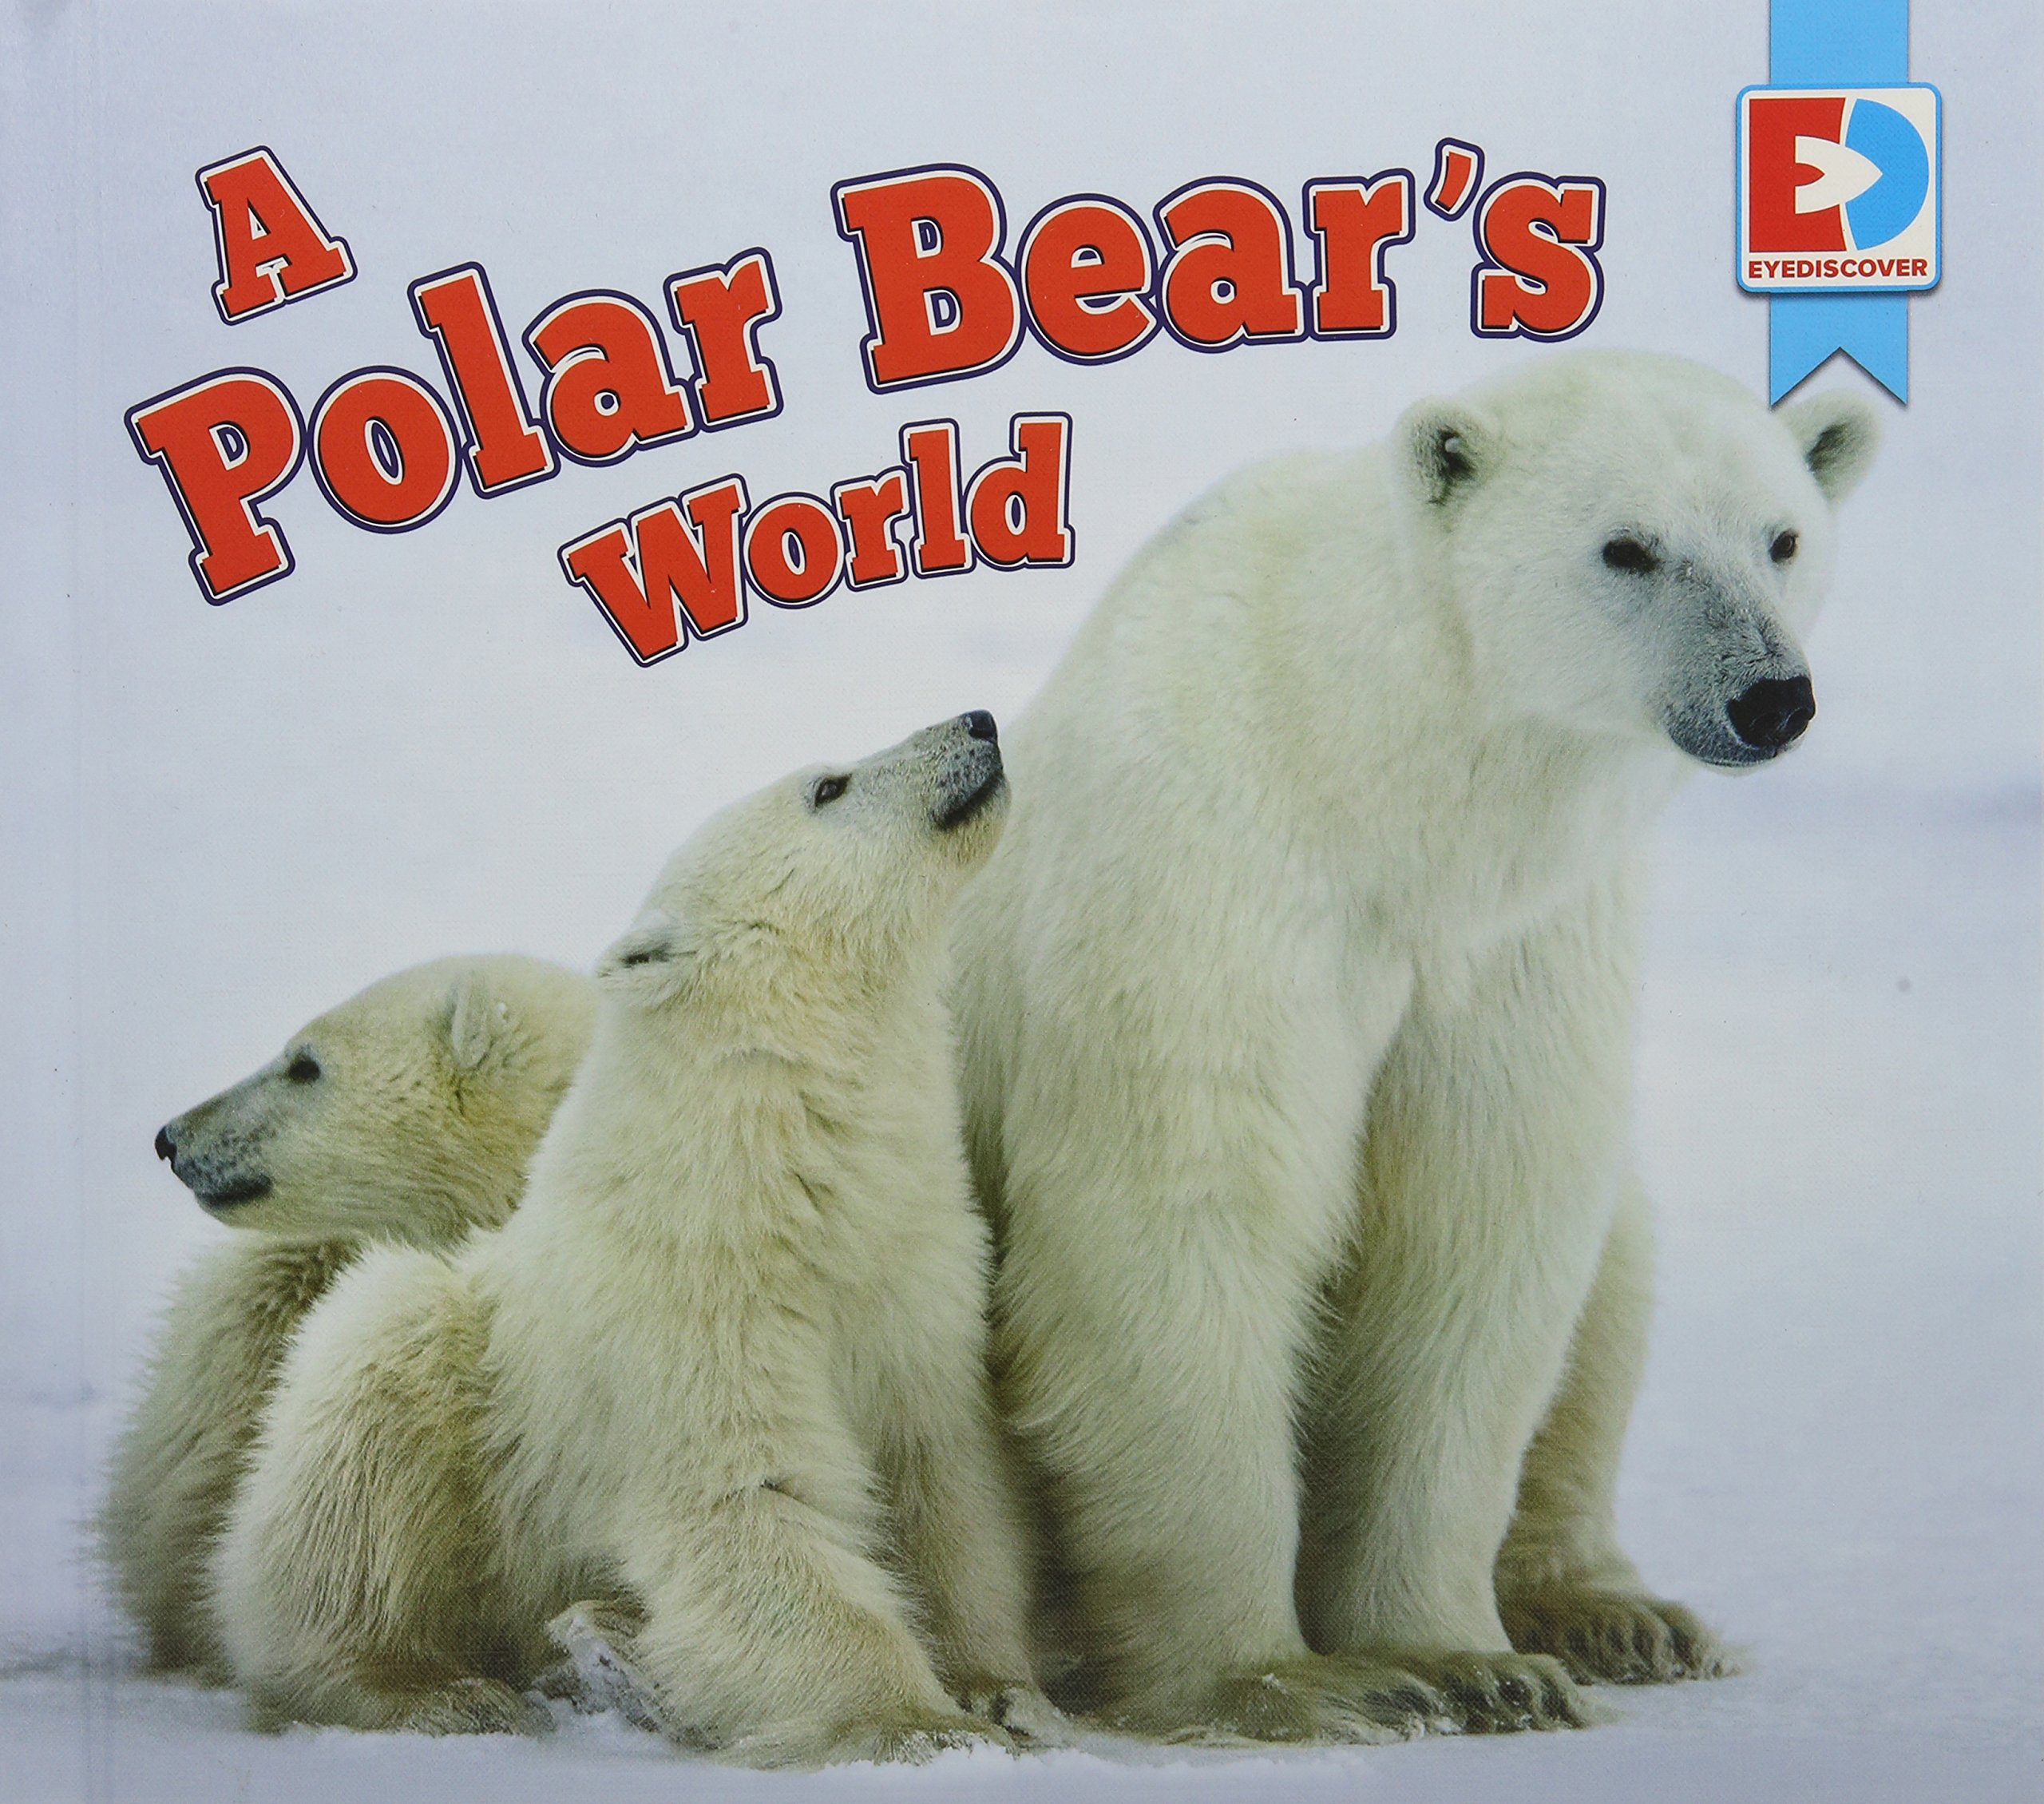 Download A Polar Bear's World (Eyediscover) ebook